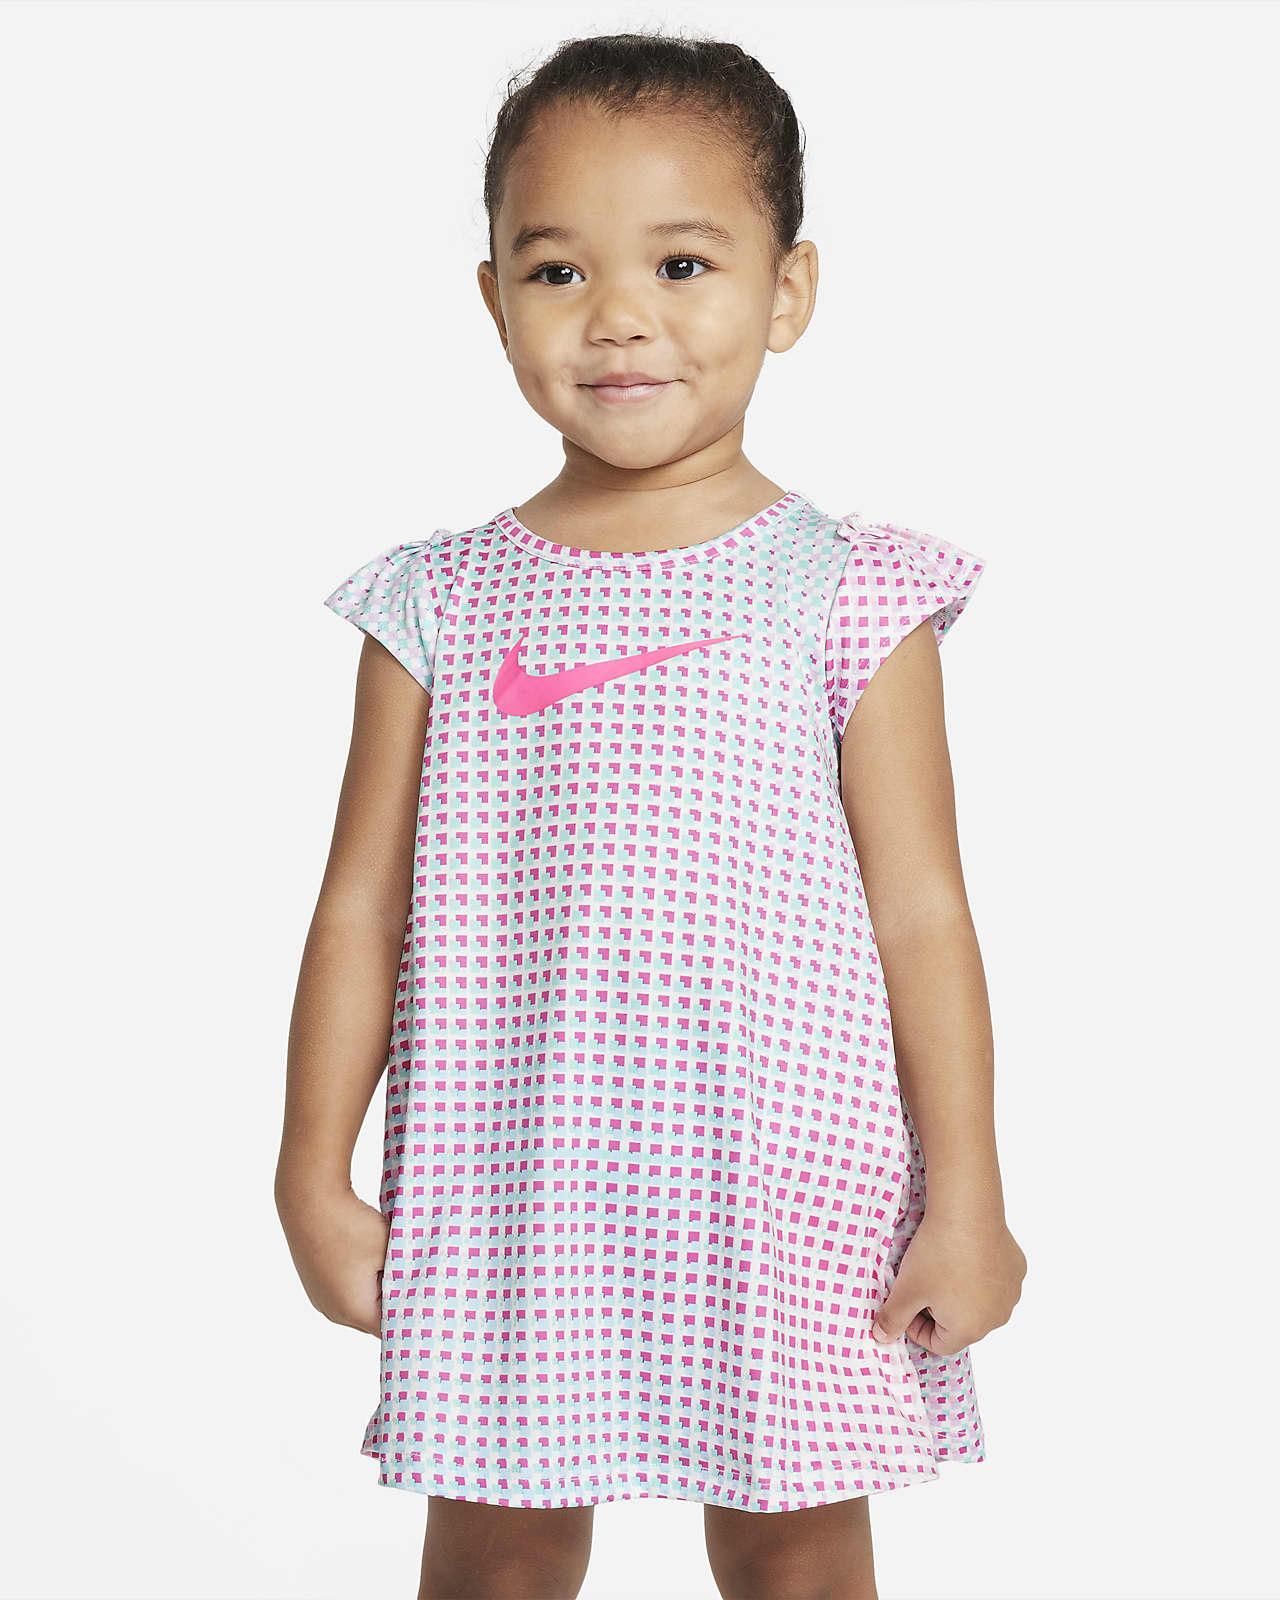 Nike Dri-FIT Baby (12-24M) Printed Dress